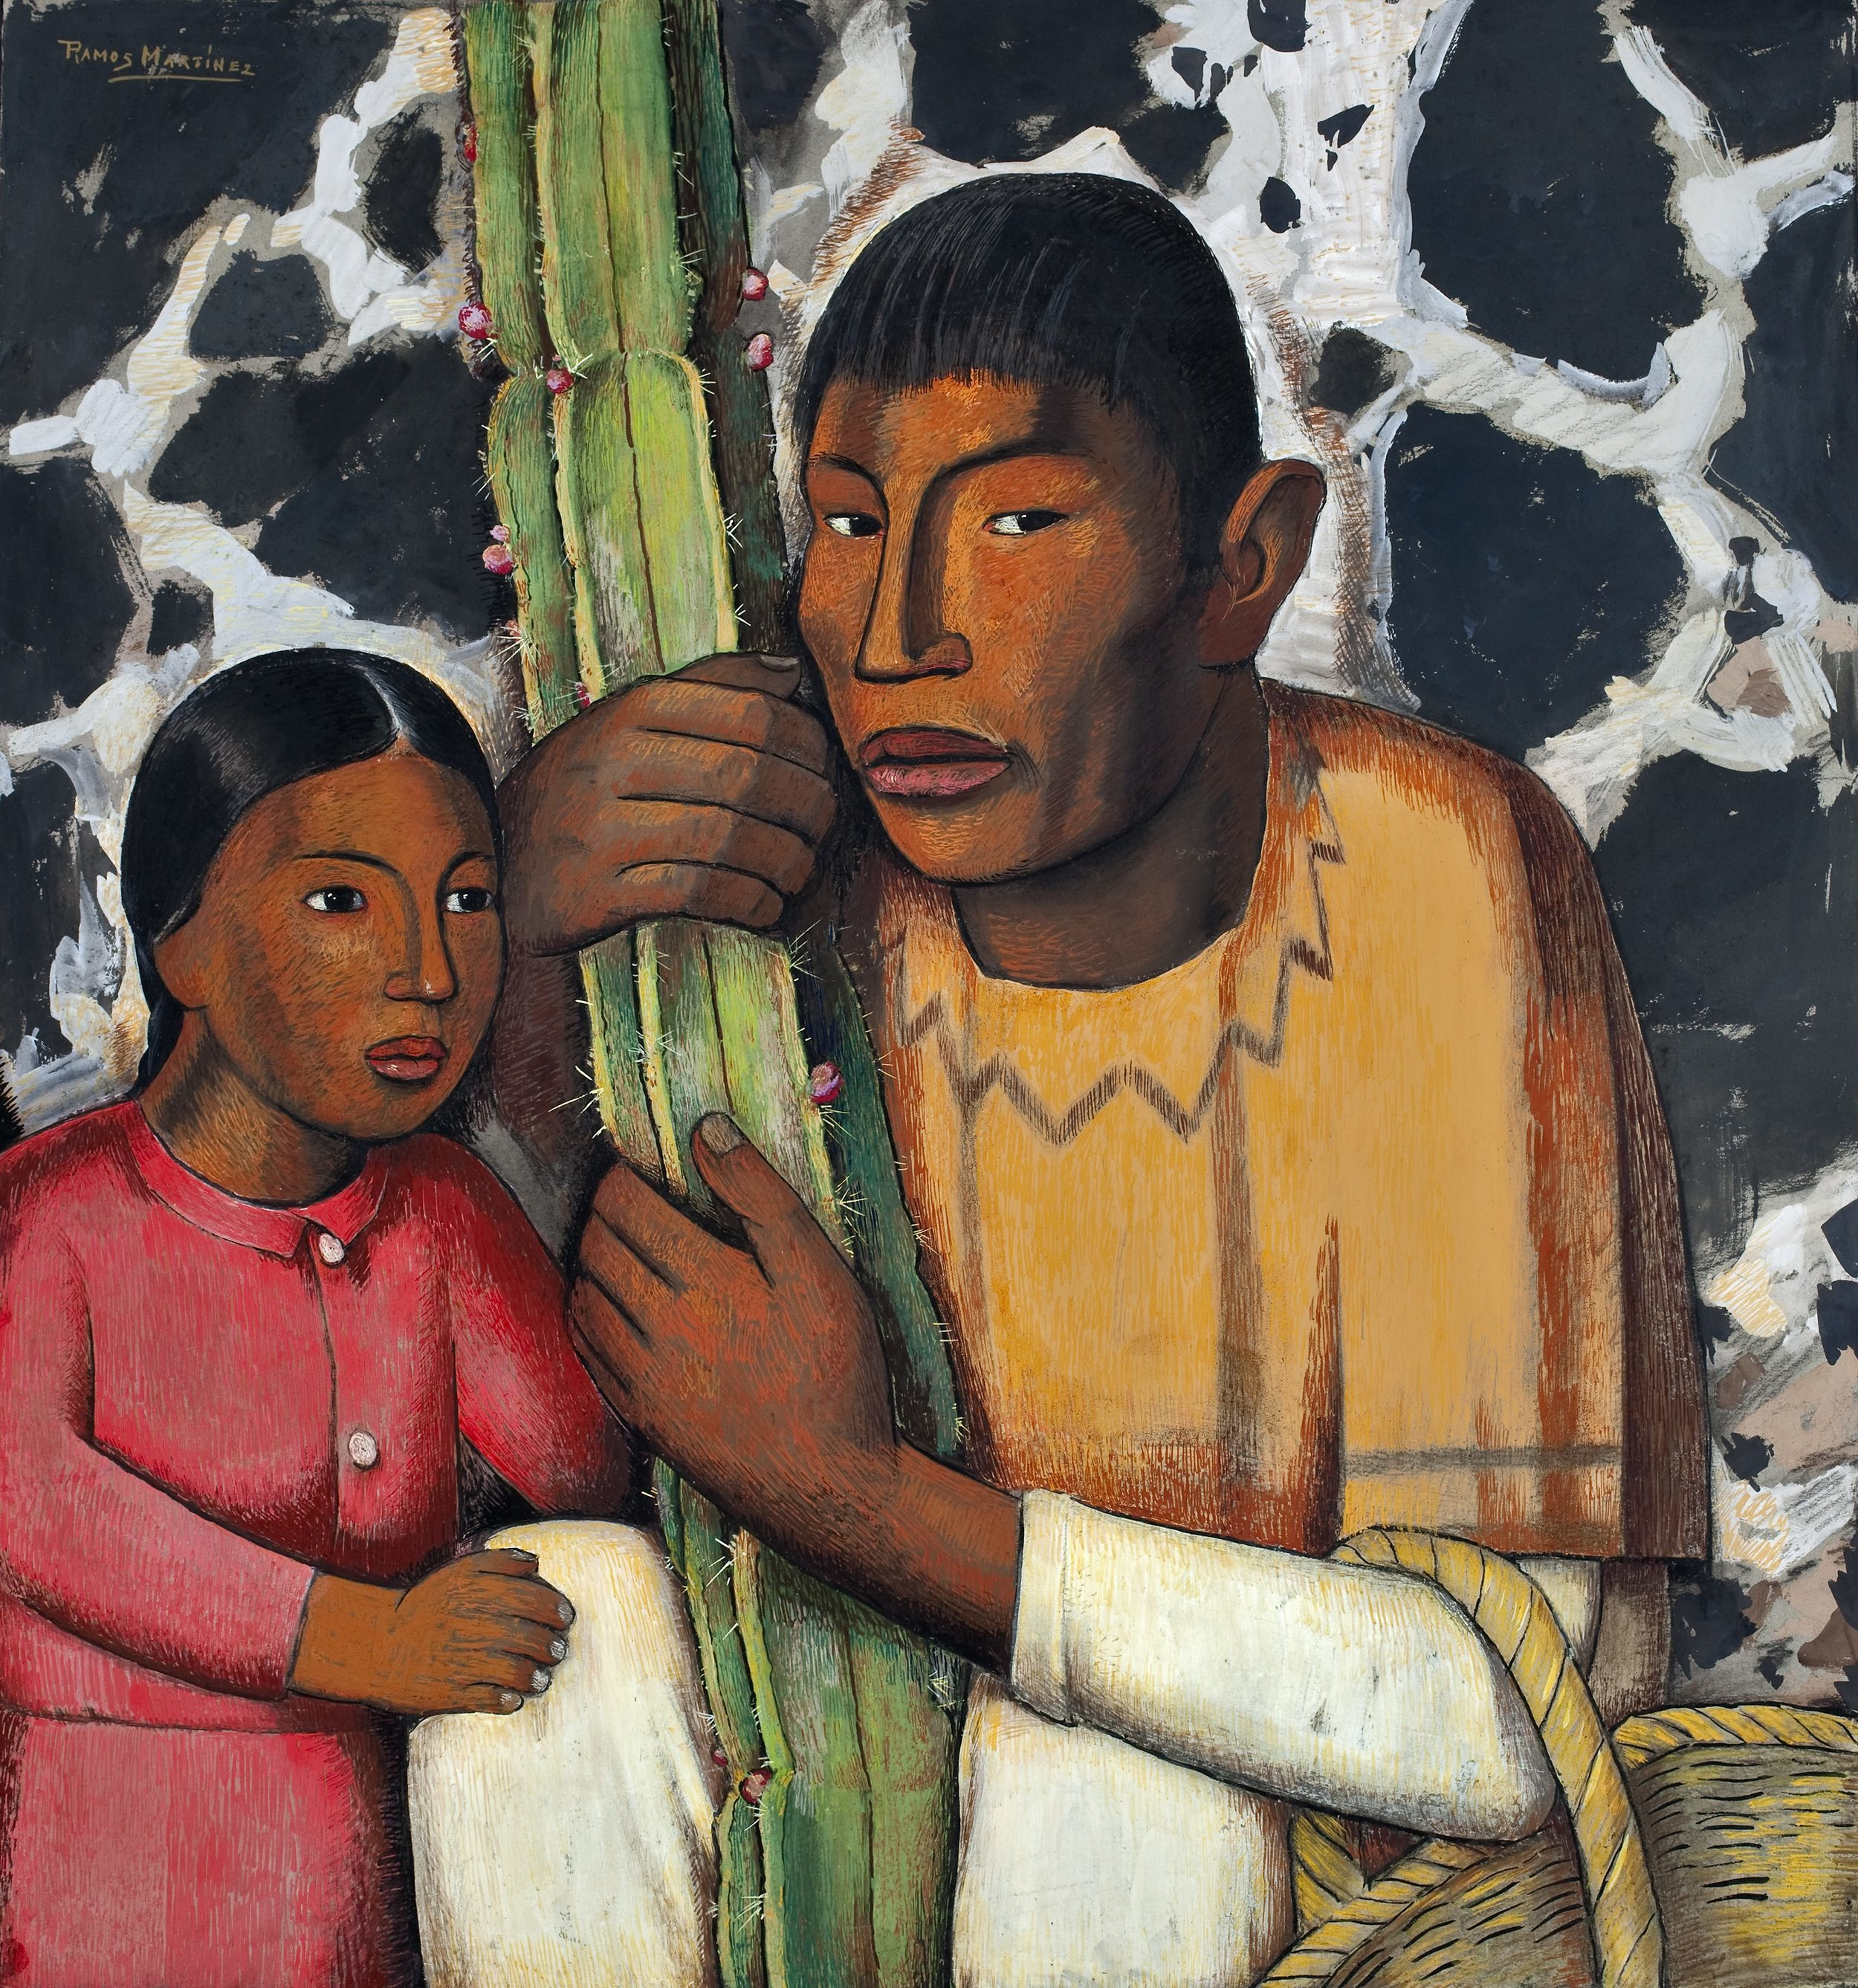 Indio del Cactus / Indian with Cactus  ca. 1938 tempera on paper / temple sobre papel 28.5 x 26.3 inches; 72.4 x 66.7 centímetros San Diego Museum of Art